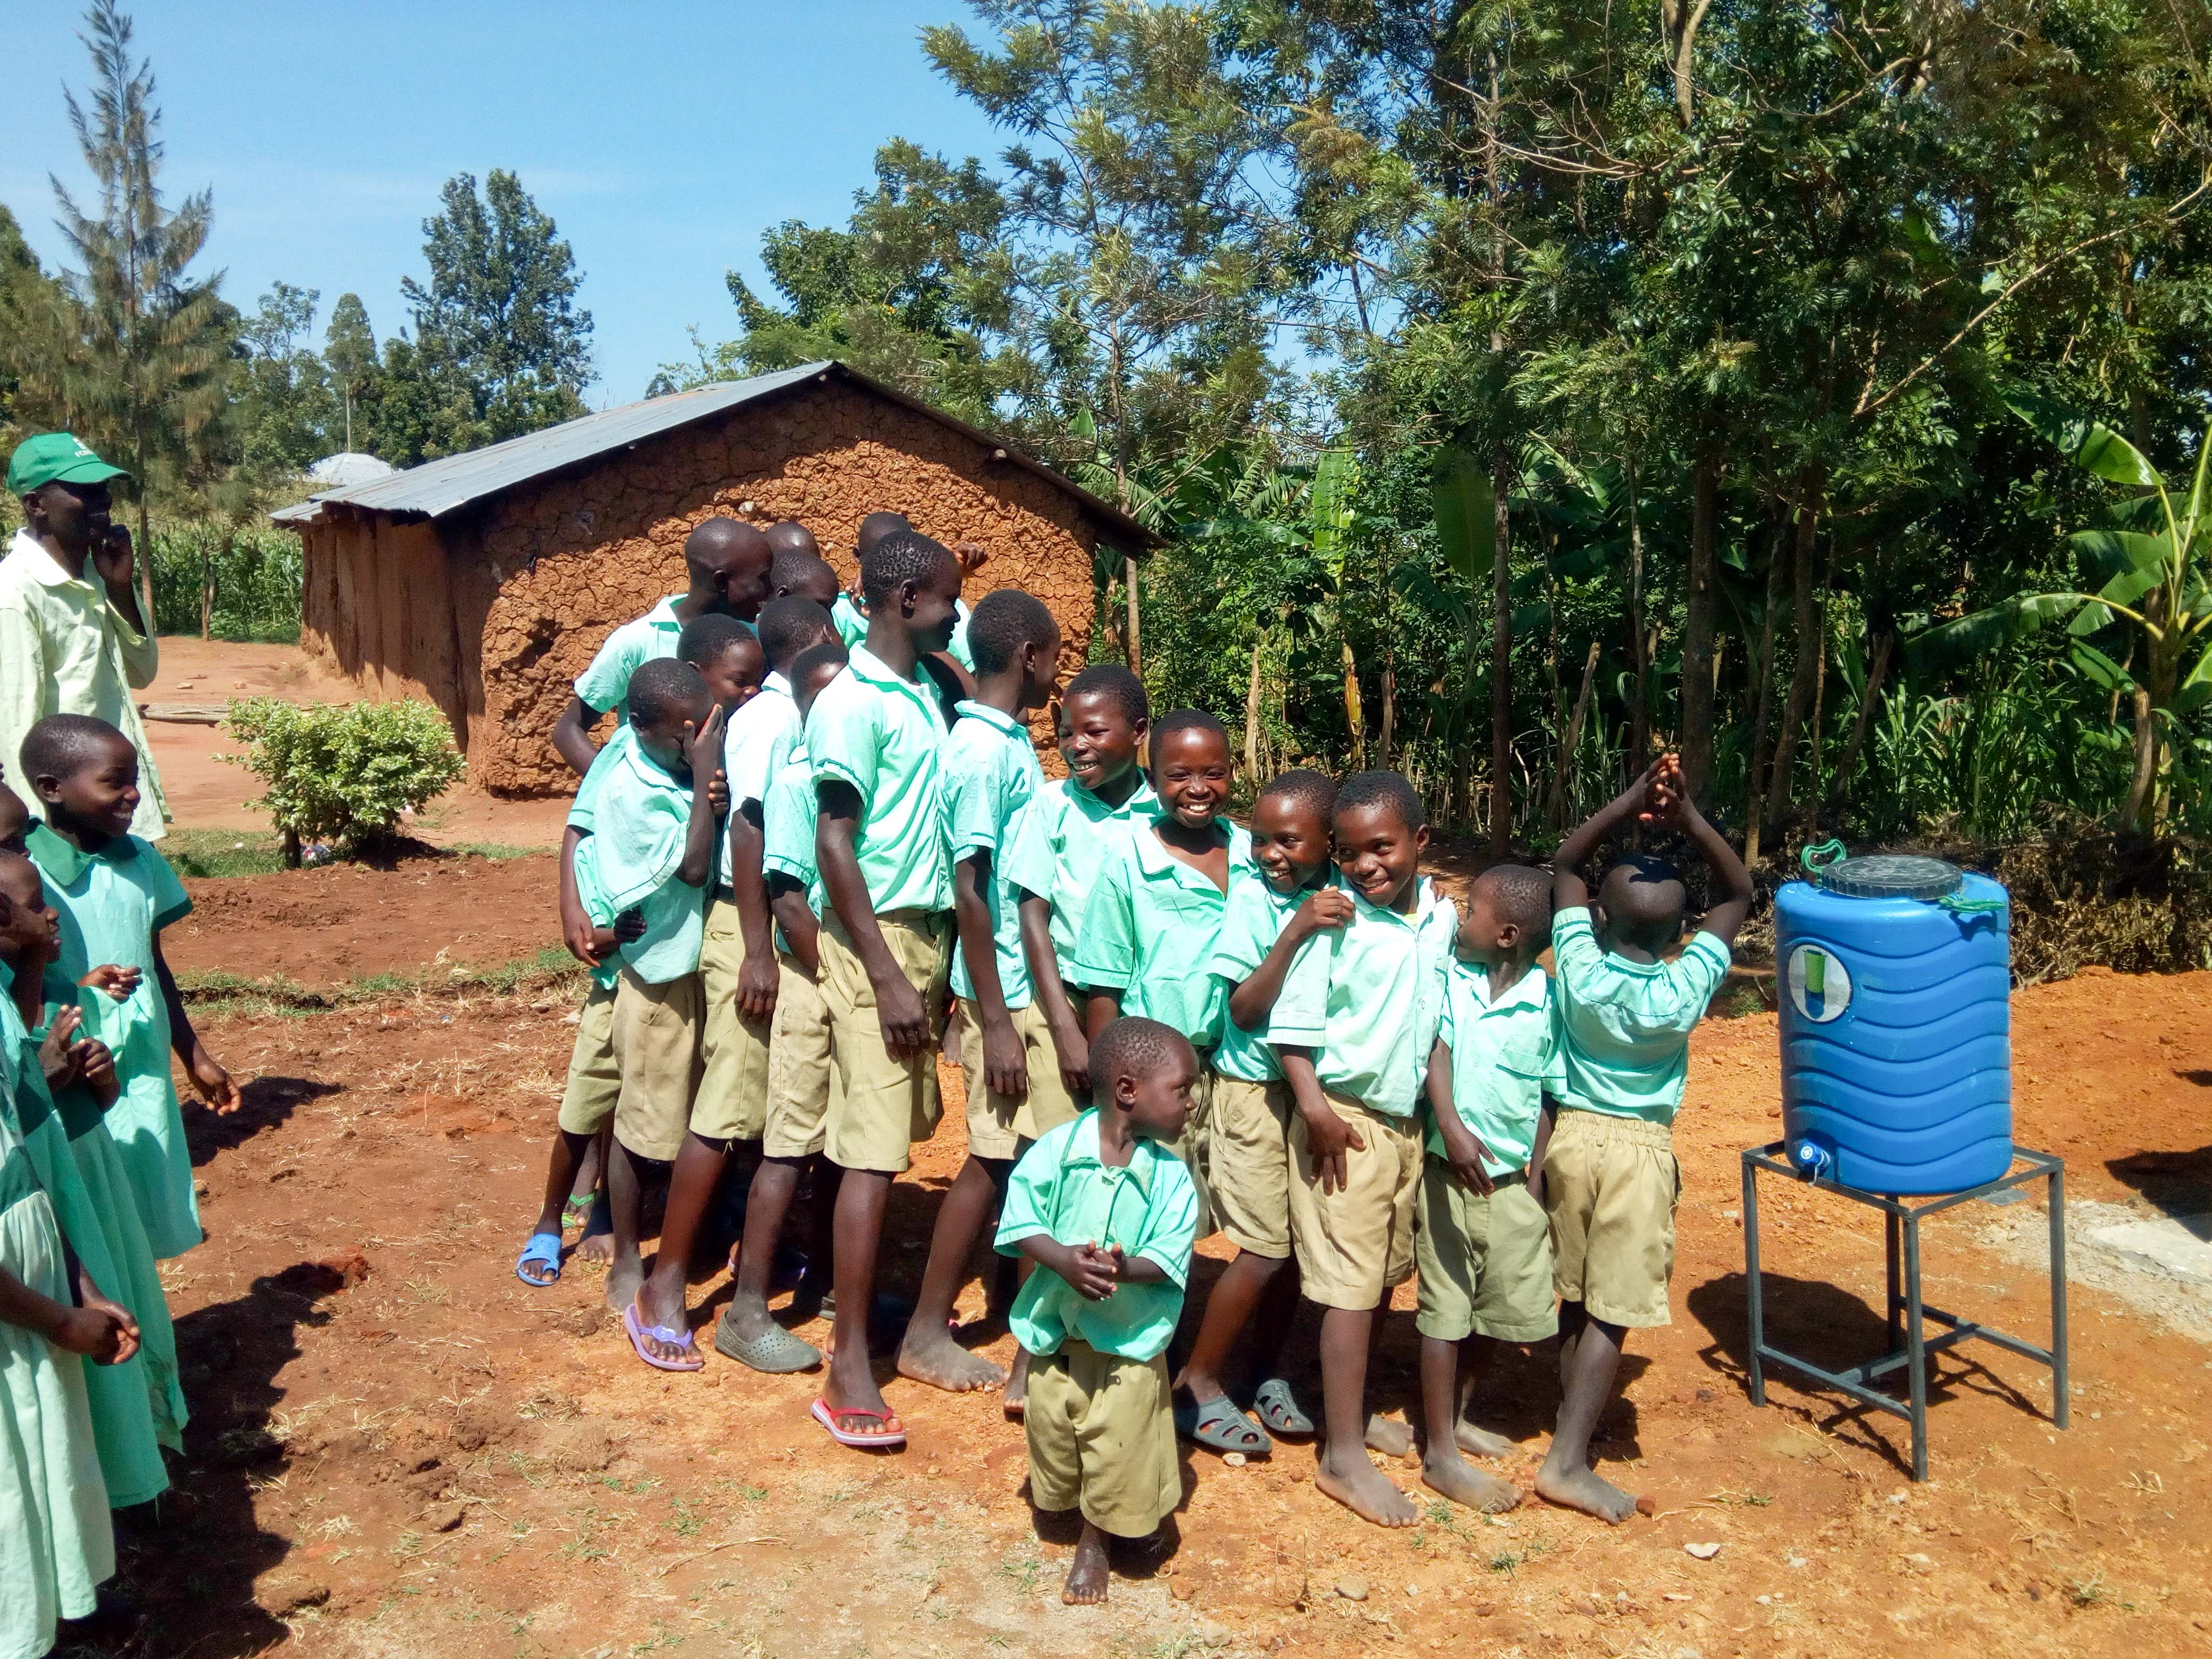 The Water Project : 21-kenya18310-handwashing-station